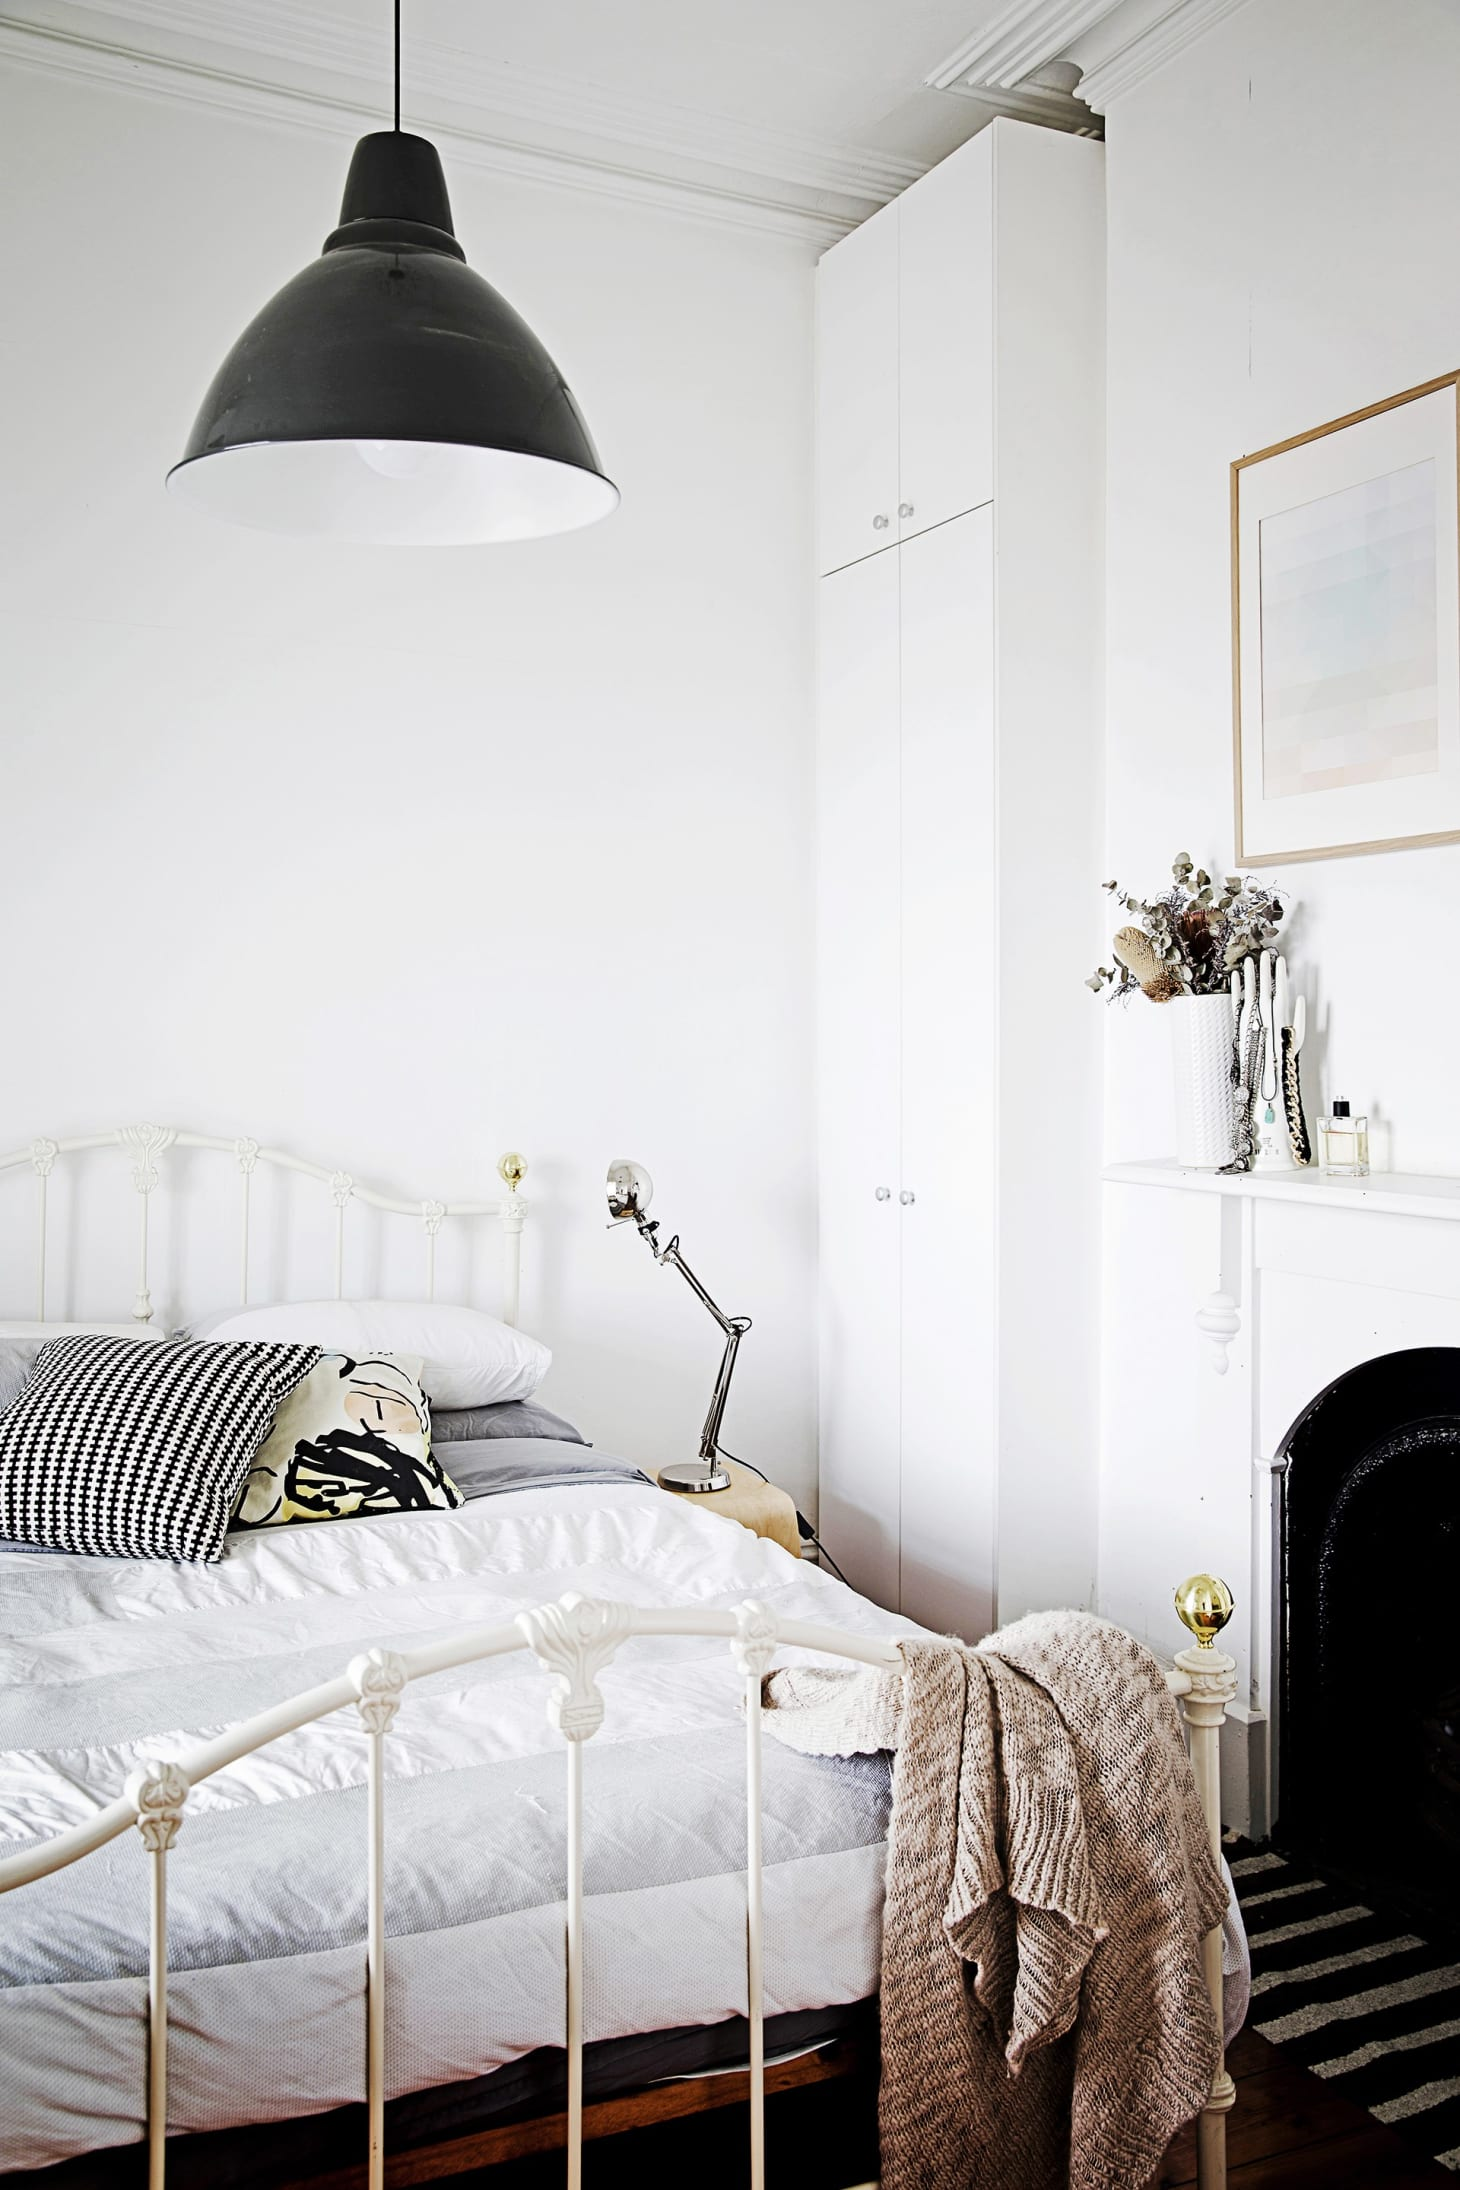 Romantic Room Designs: Romantic Bedroom Decorating Ideas